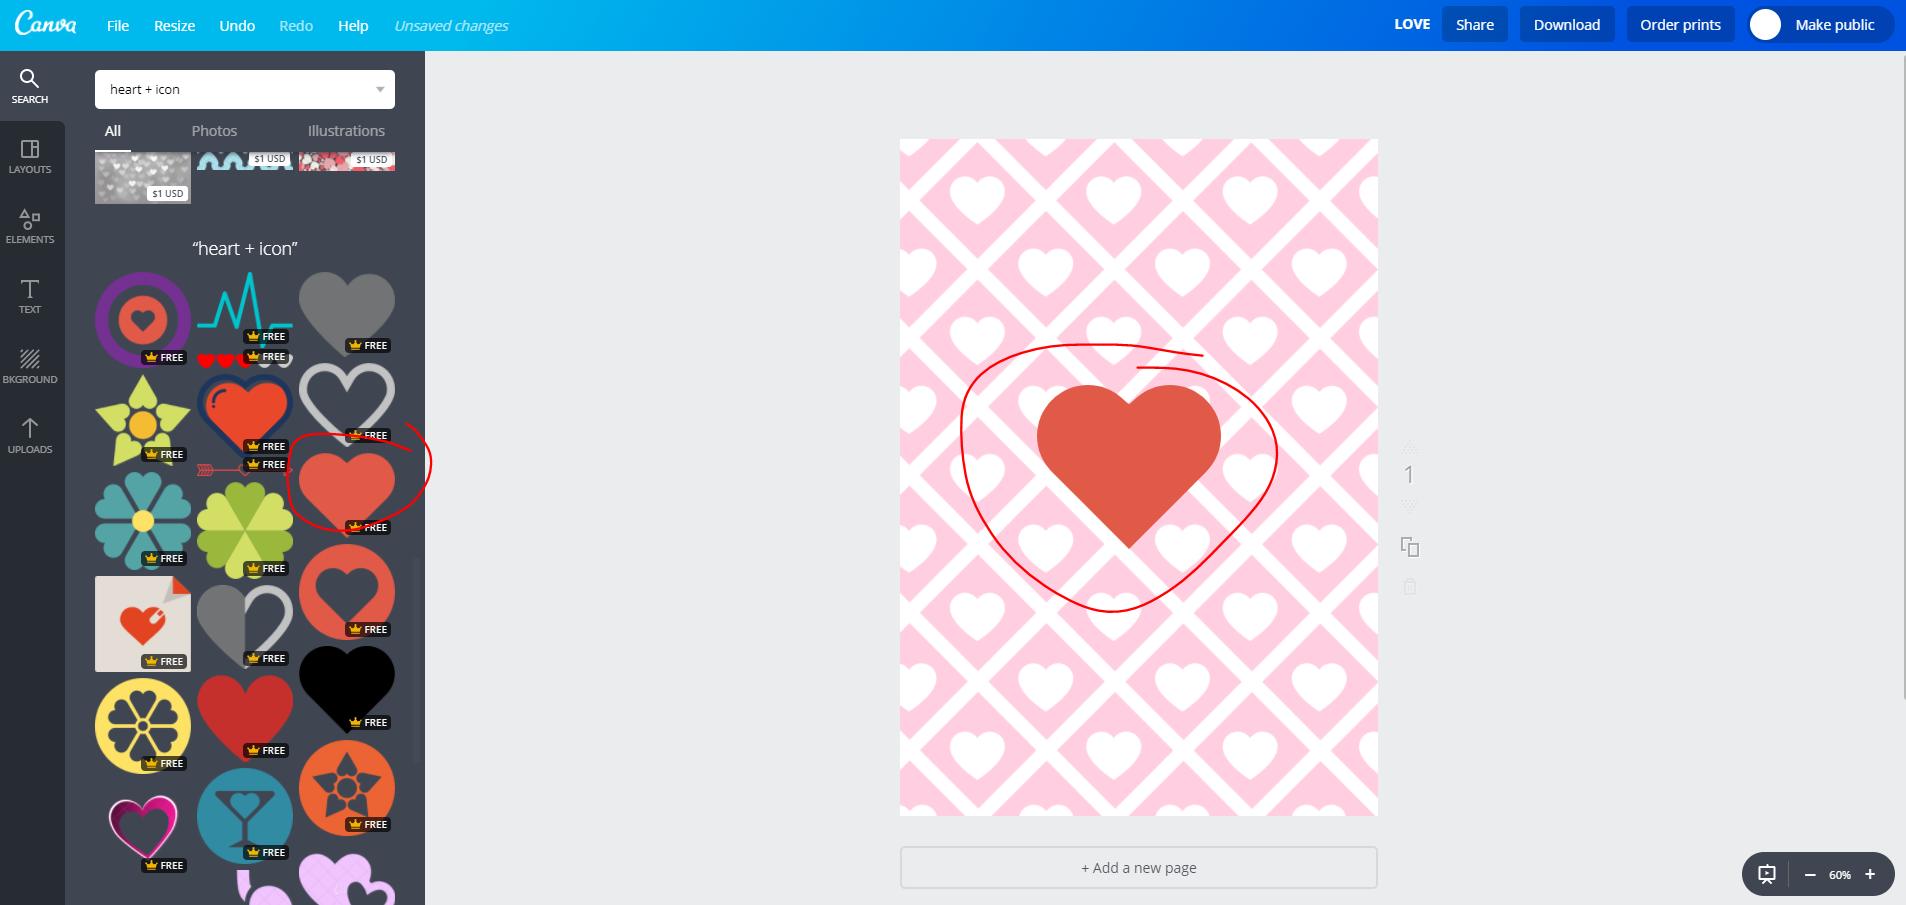 canva image heart icon